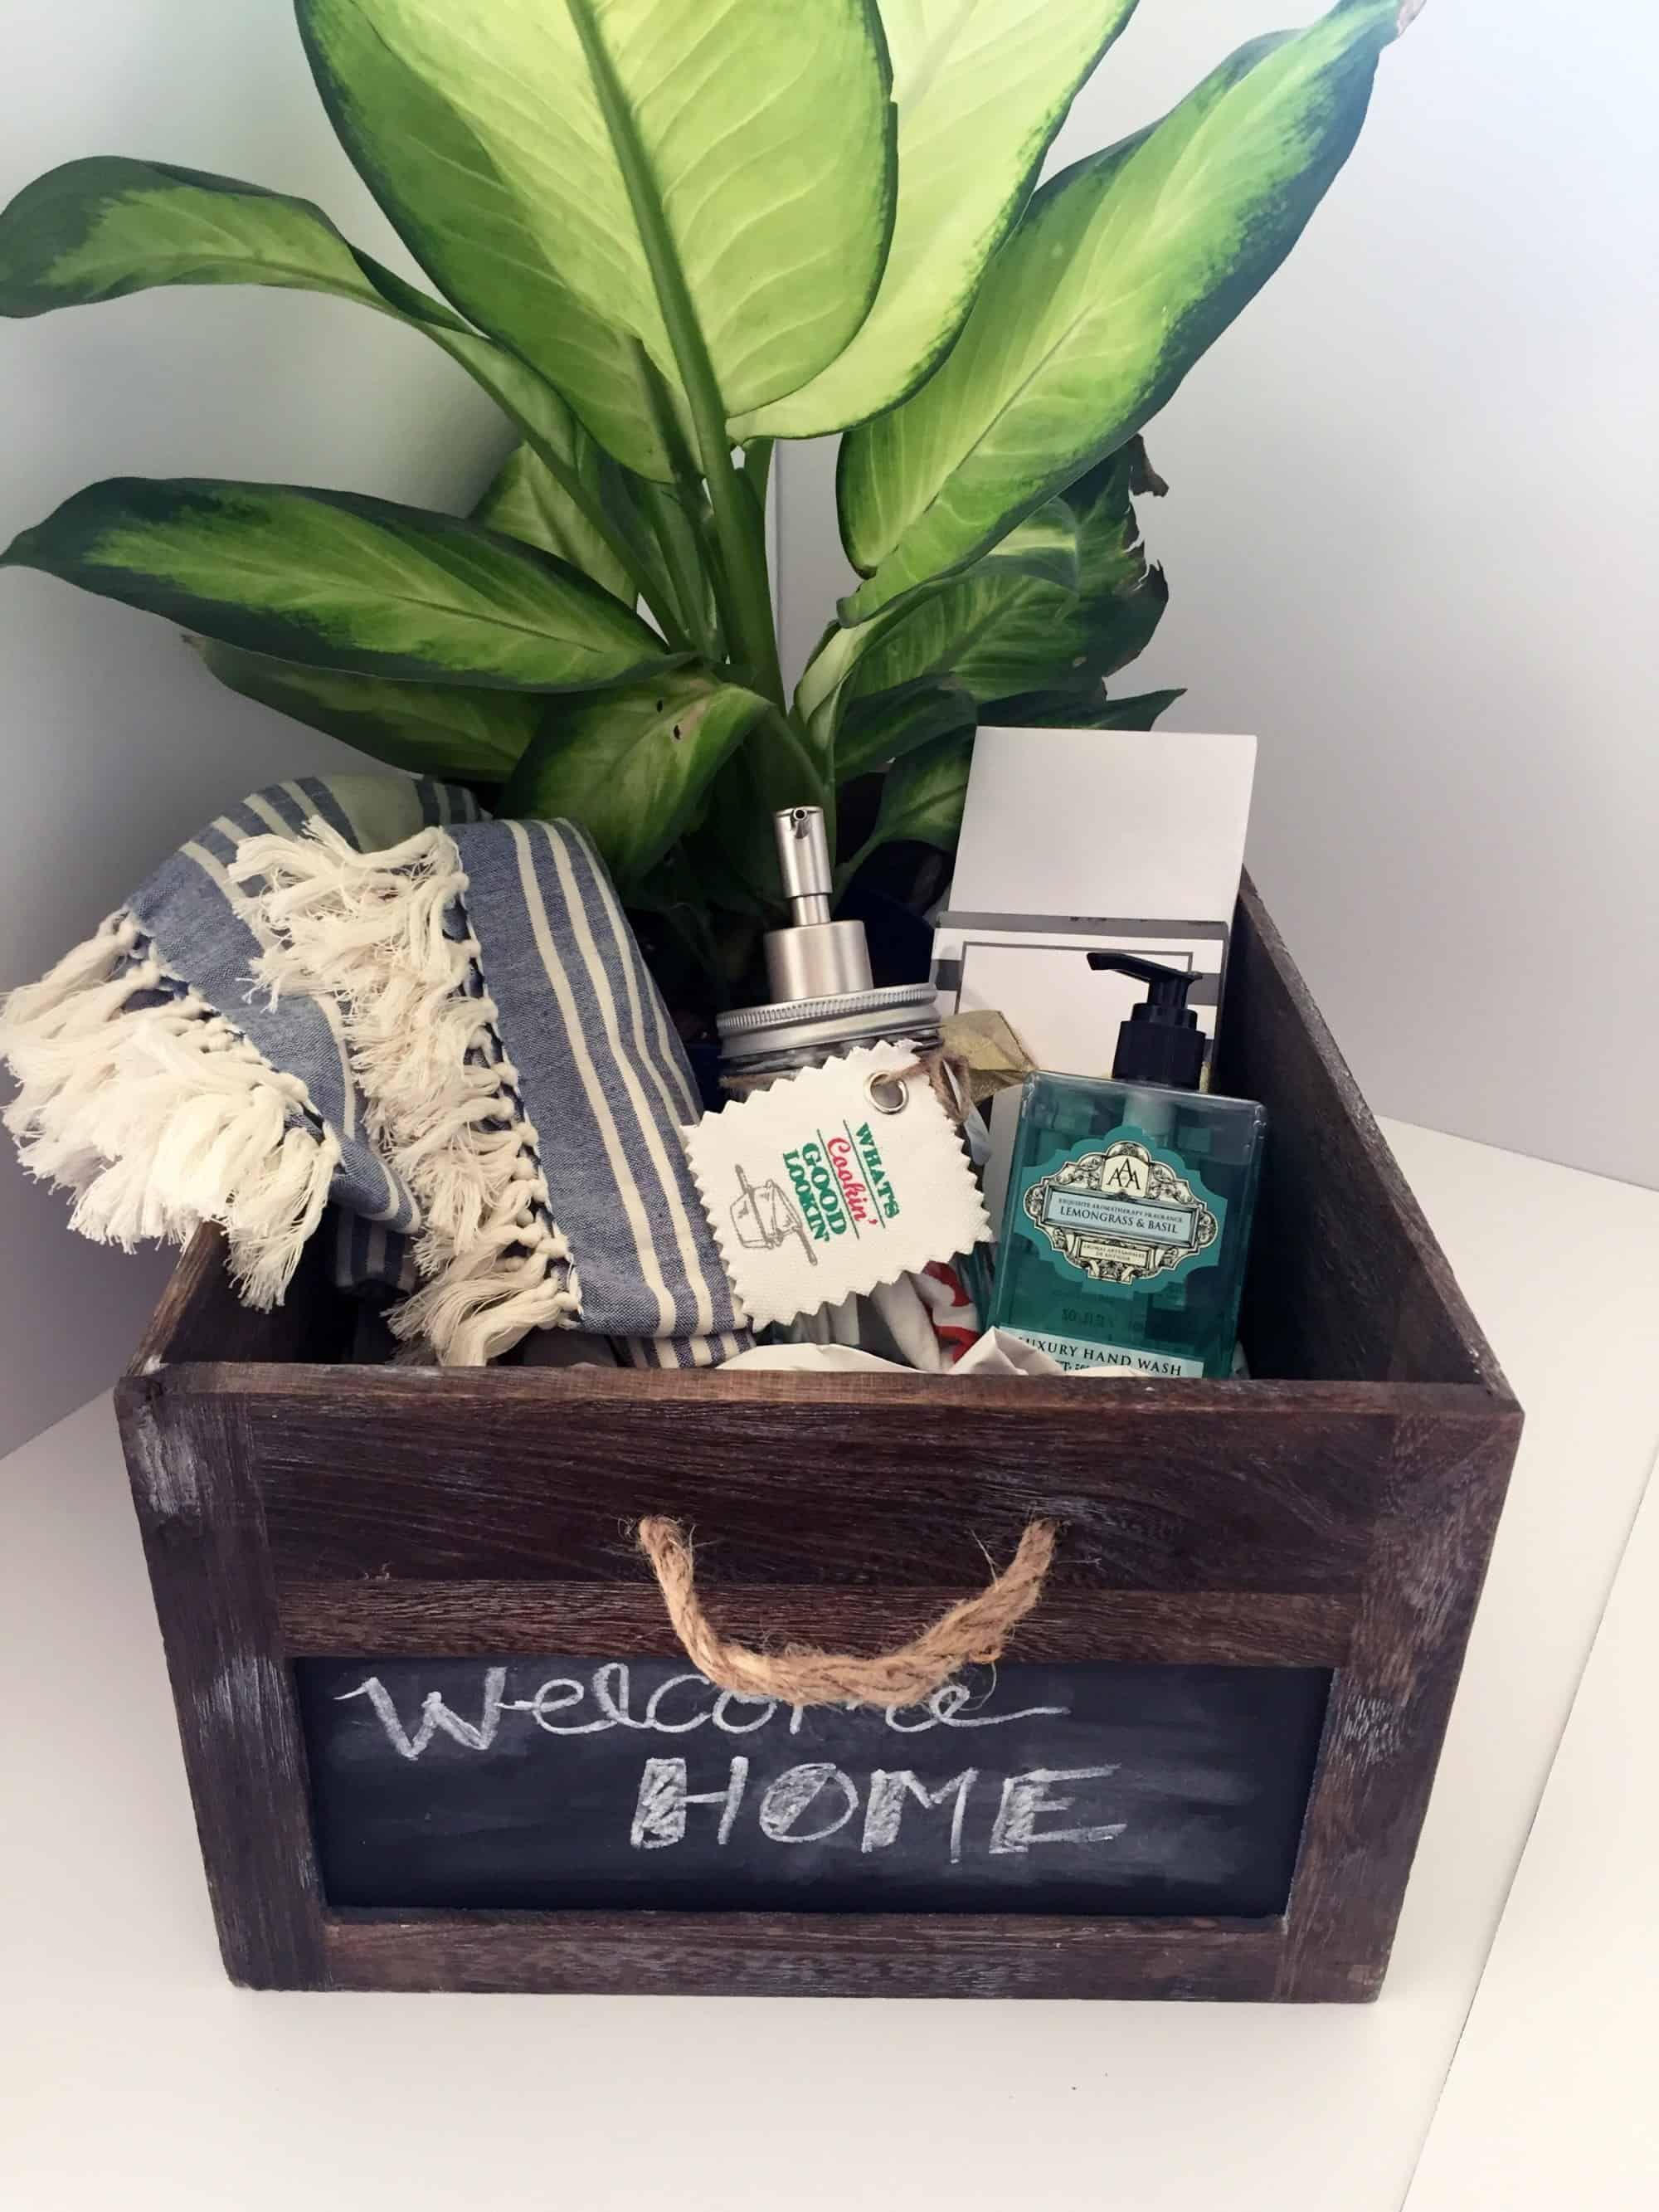 Cool homemade housewarming gift ideas homemade